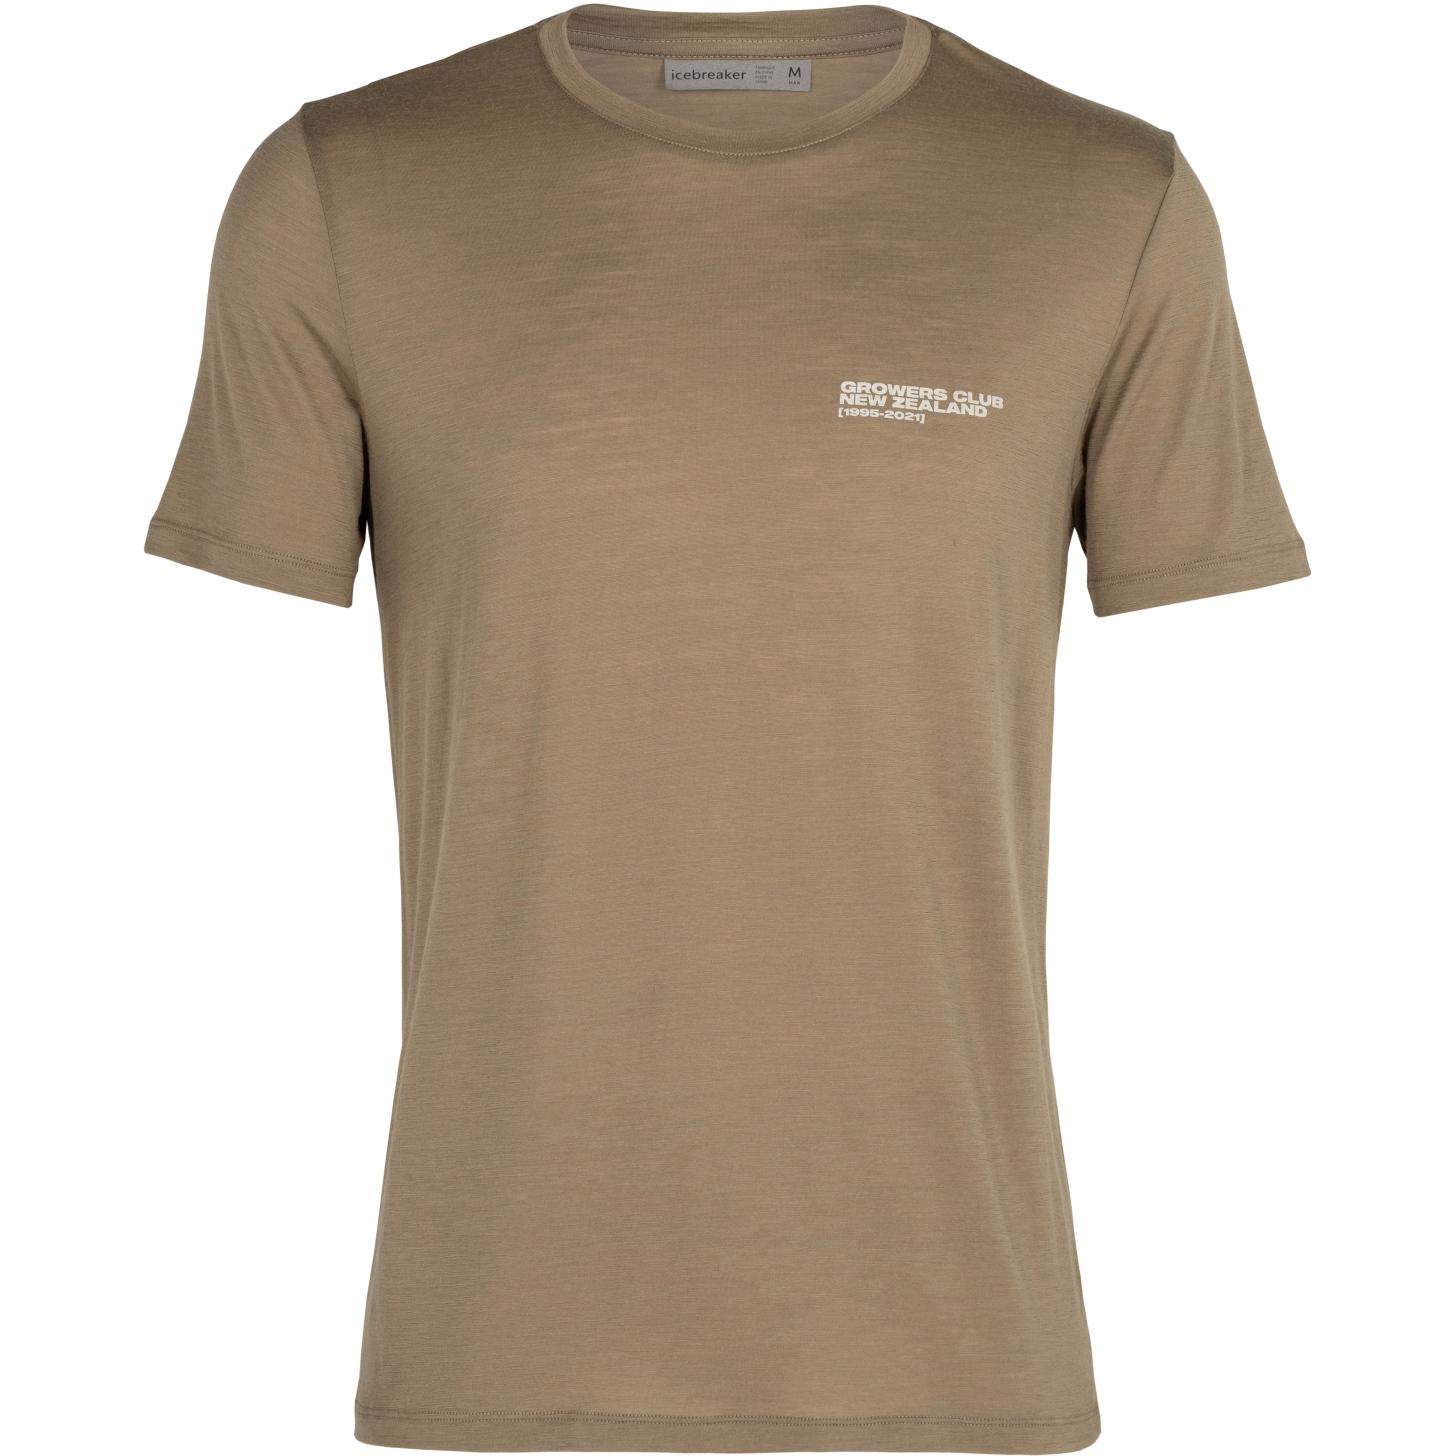 Produktbild von Icebreaker Tech Lite Crewe Growers Club Herren T-Shirt - Flint